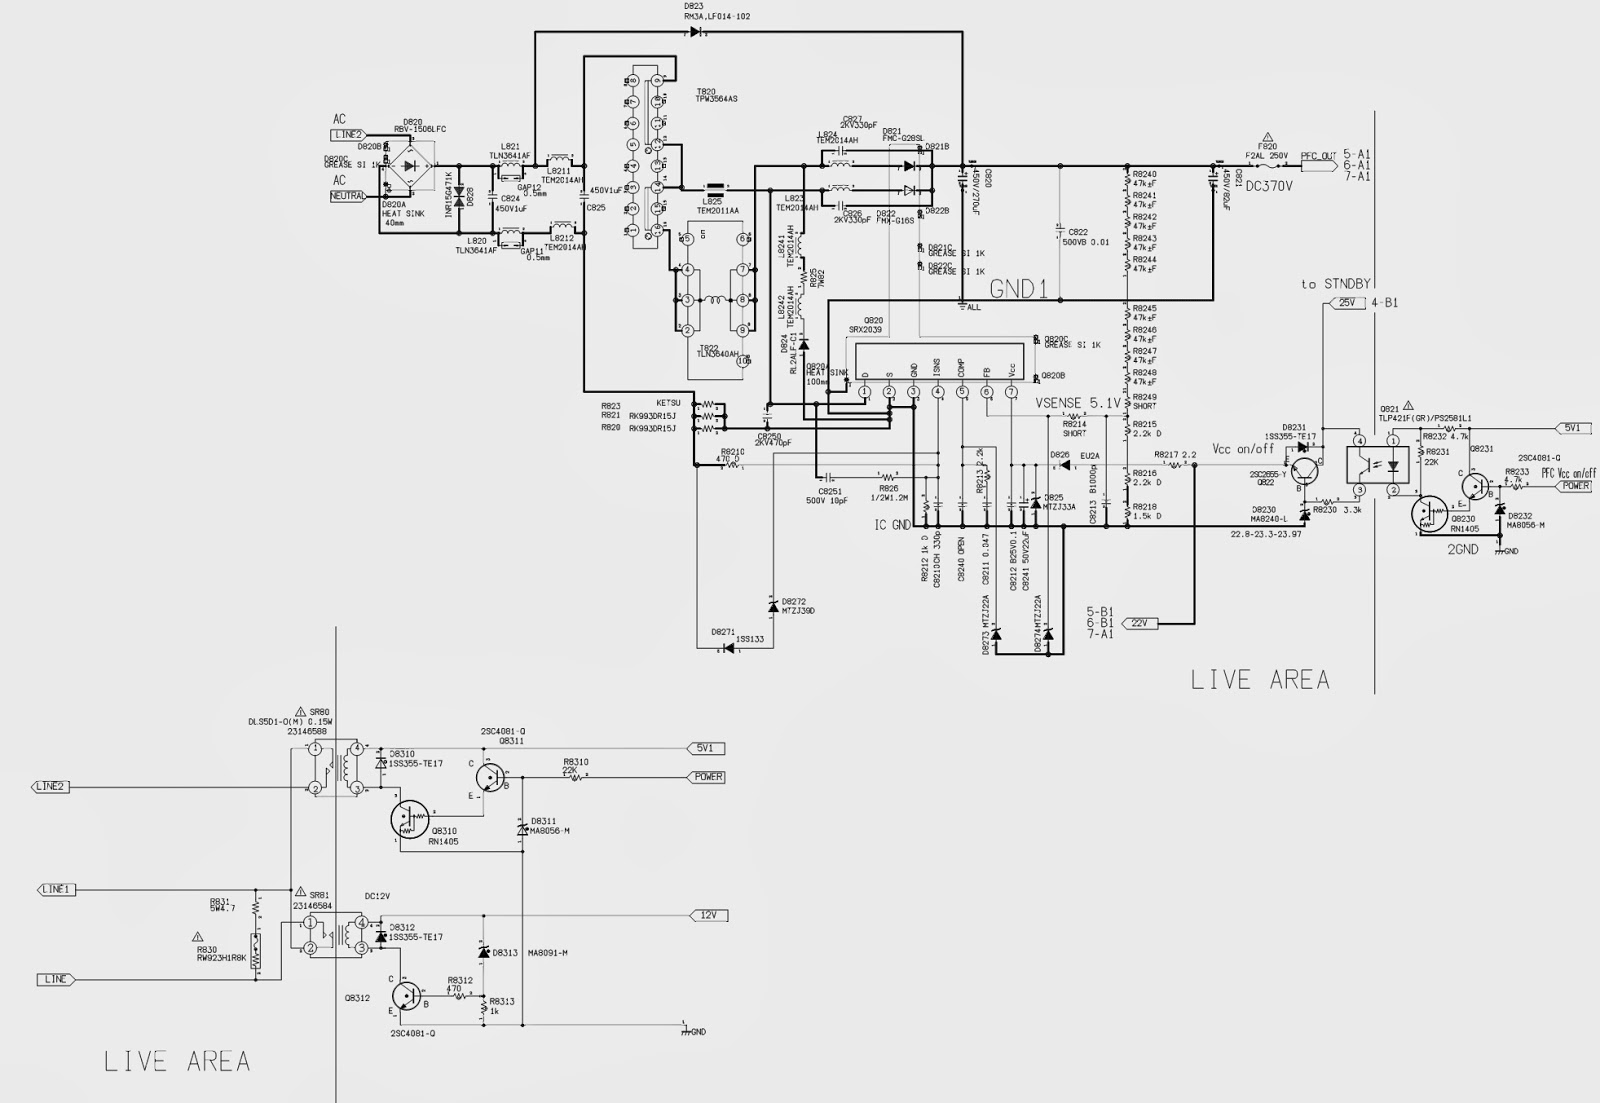 medium resolution of toshiba 32 37 42wl58 series lcd tvs power supply schematics lcd tvs power supply schematics circuit diagram str